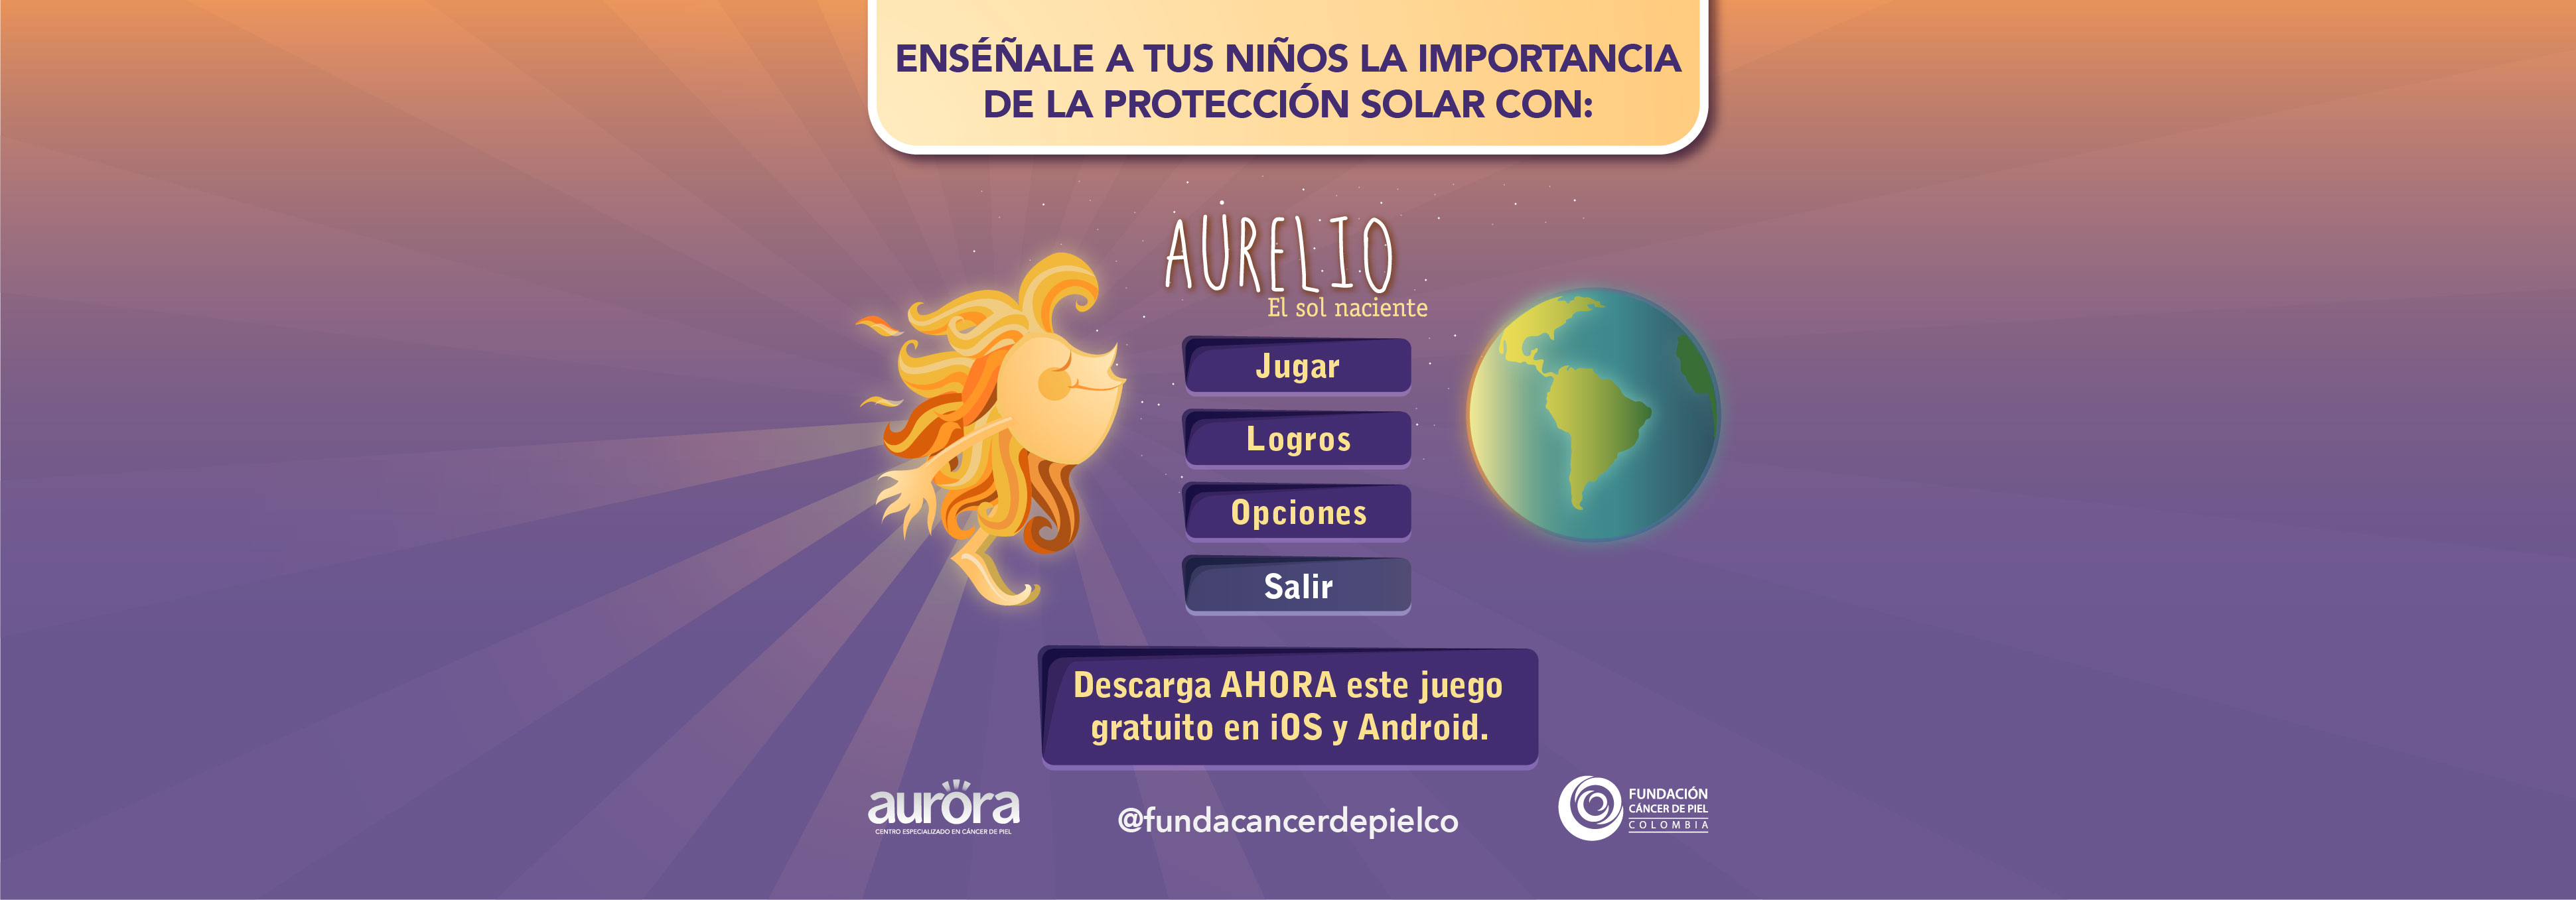 Lanzamiento Aurelio Banners-02